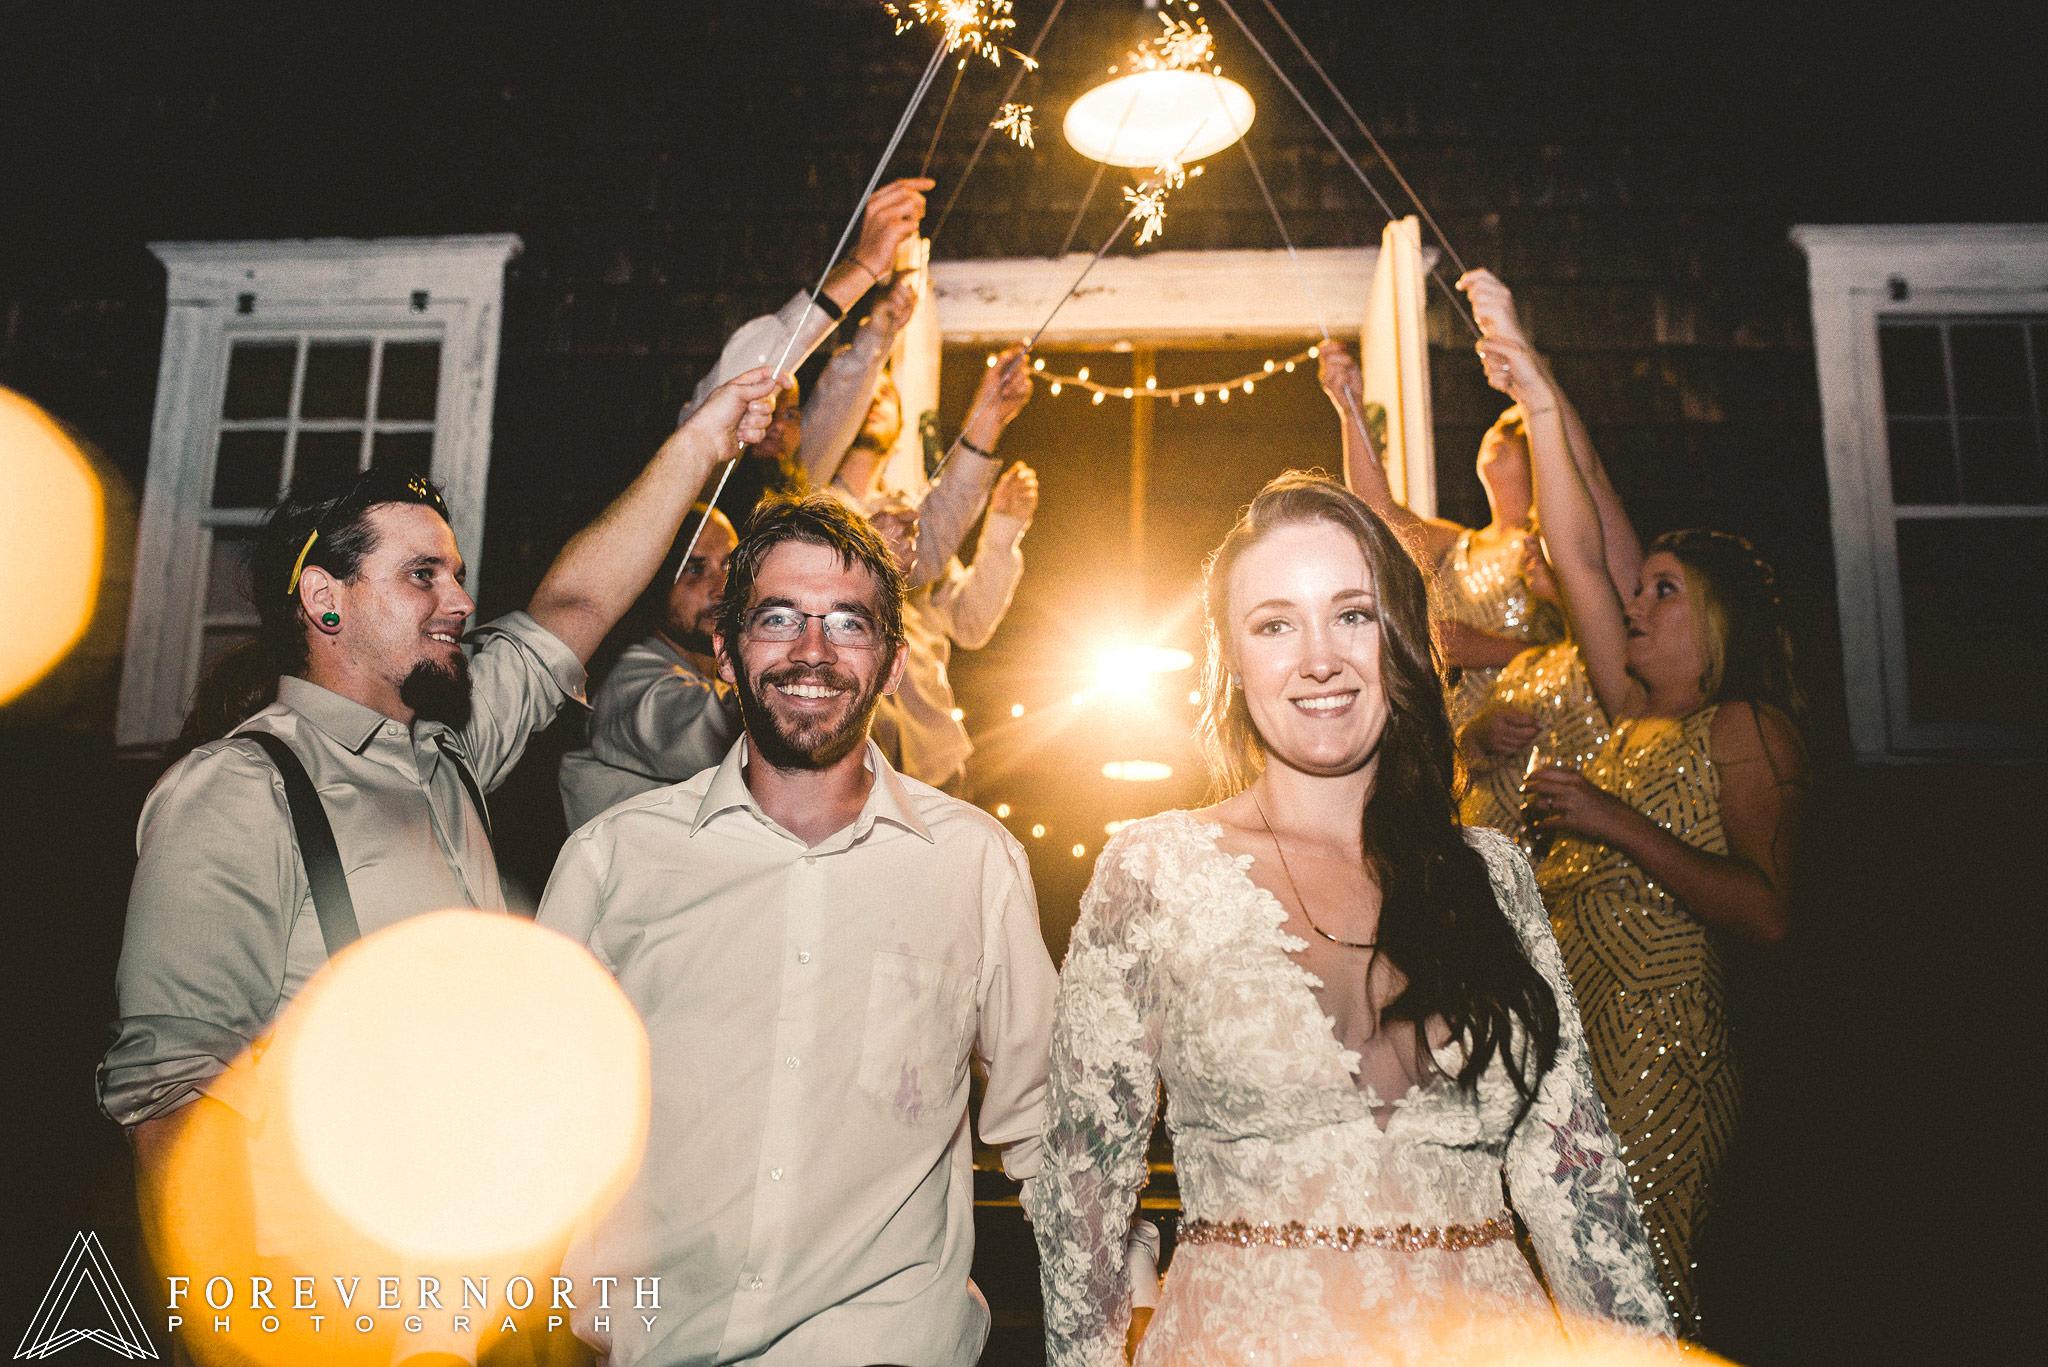 Perkins-Whitesbog-Village-Wedding-Photographer-37.JPG